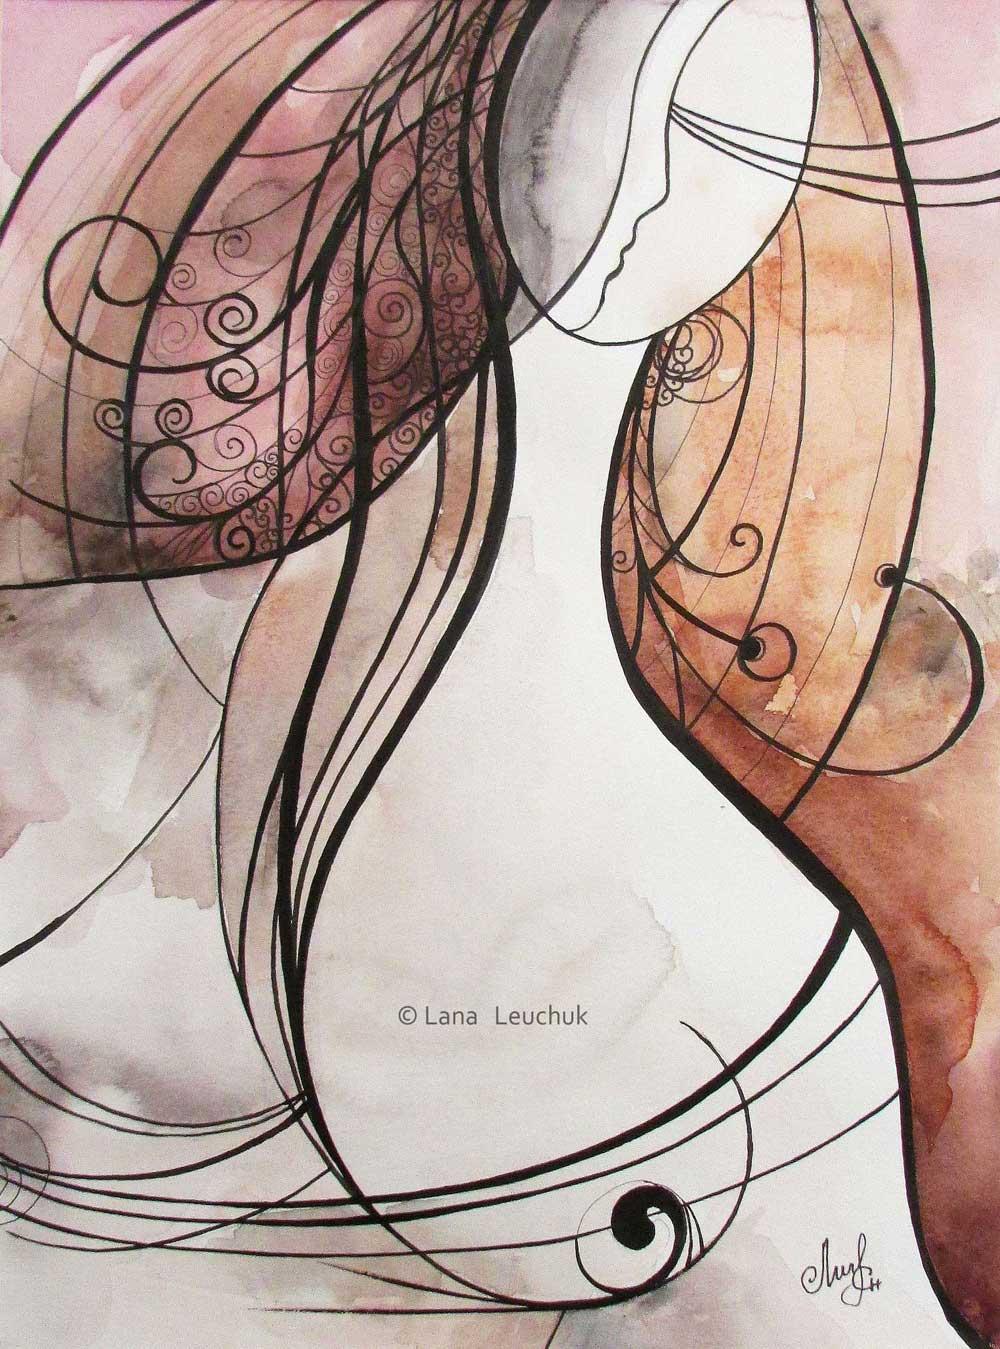 Feminine-art-by-Lana-Leuchuk-Lanagraphic